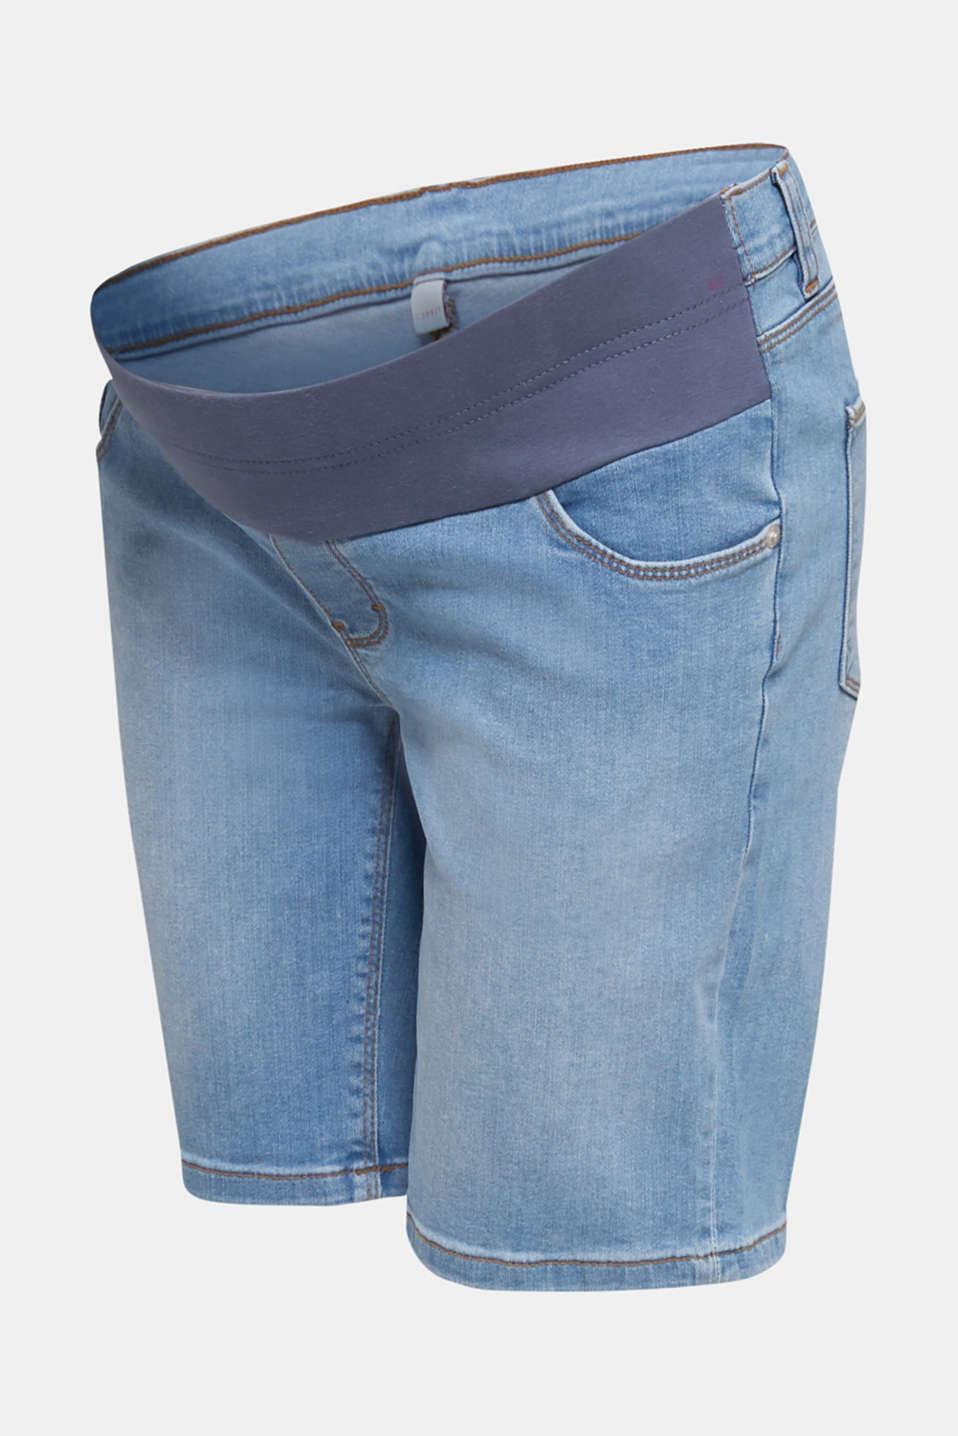 Denim shorts with an under-bump waistband, LCLIGHTWASH, detail image number 6